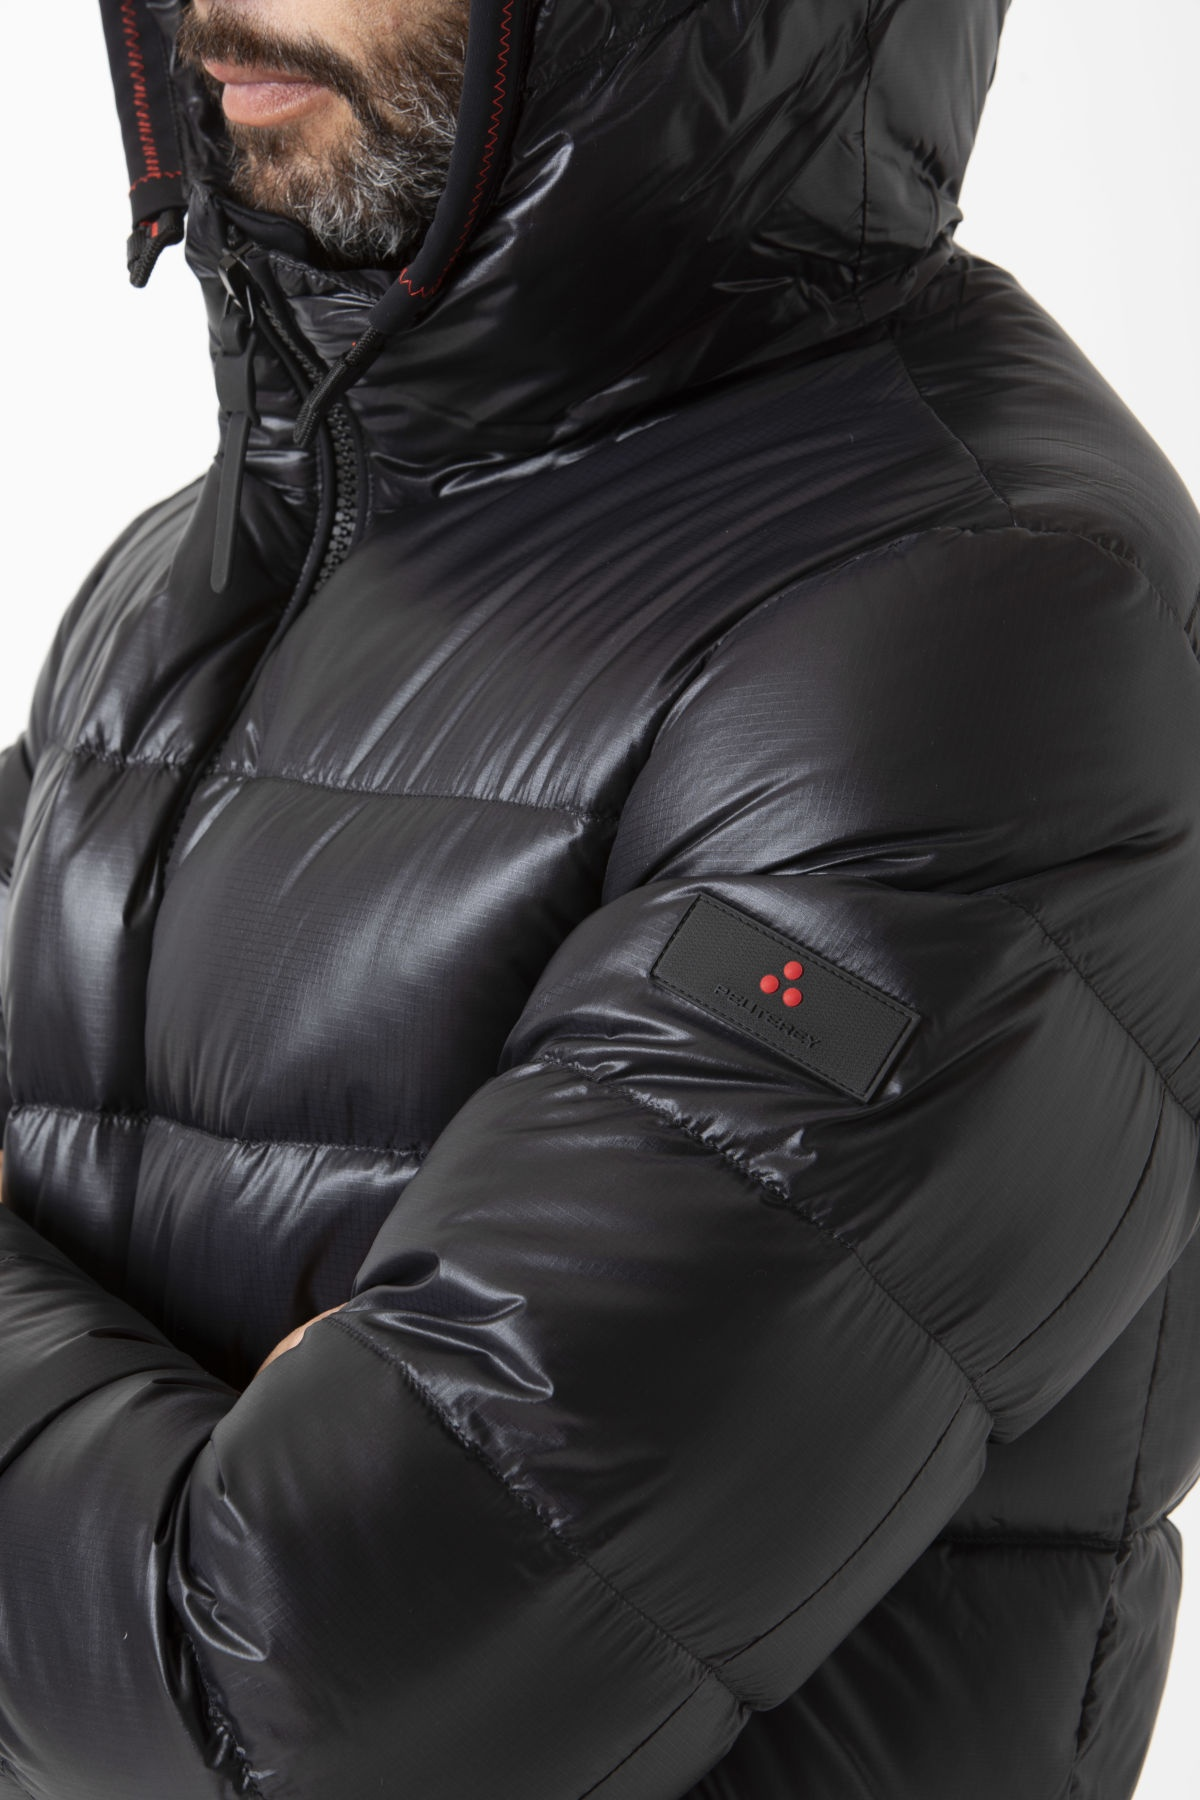 HONOVA Jacket for man PEUTEREY FW Rione Fontana